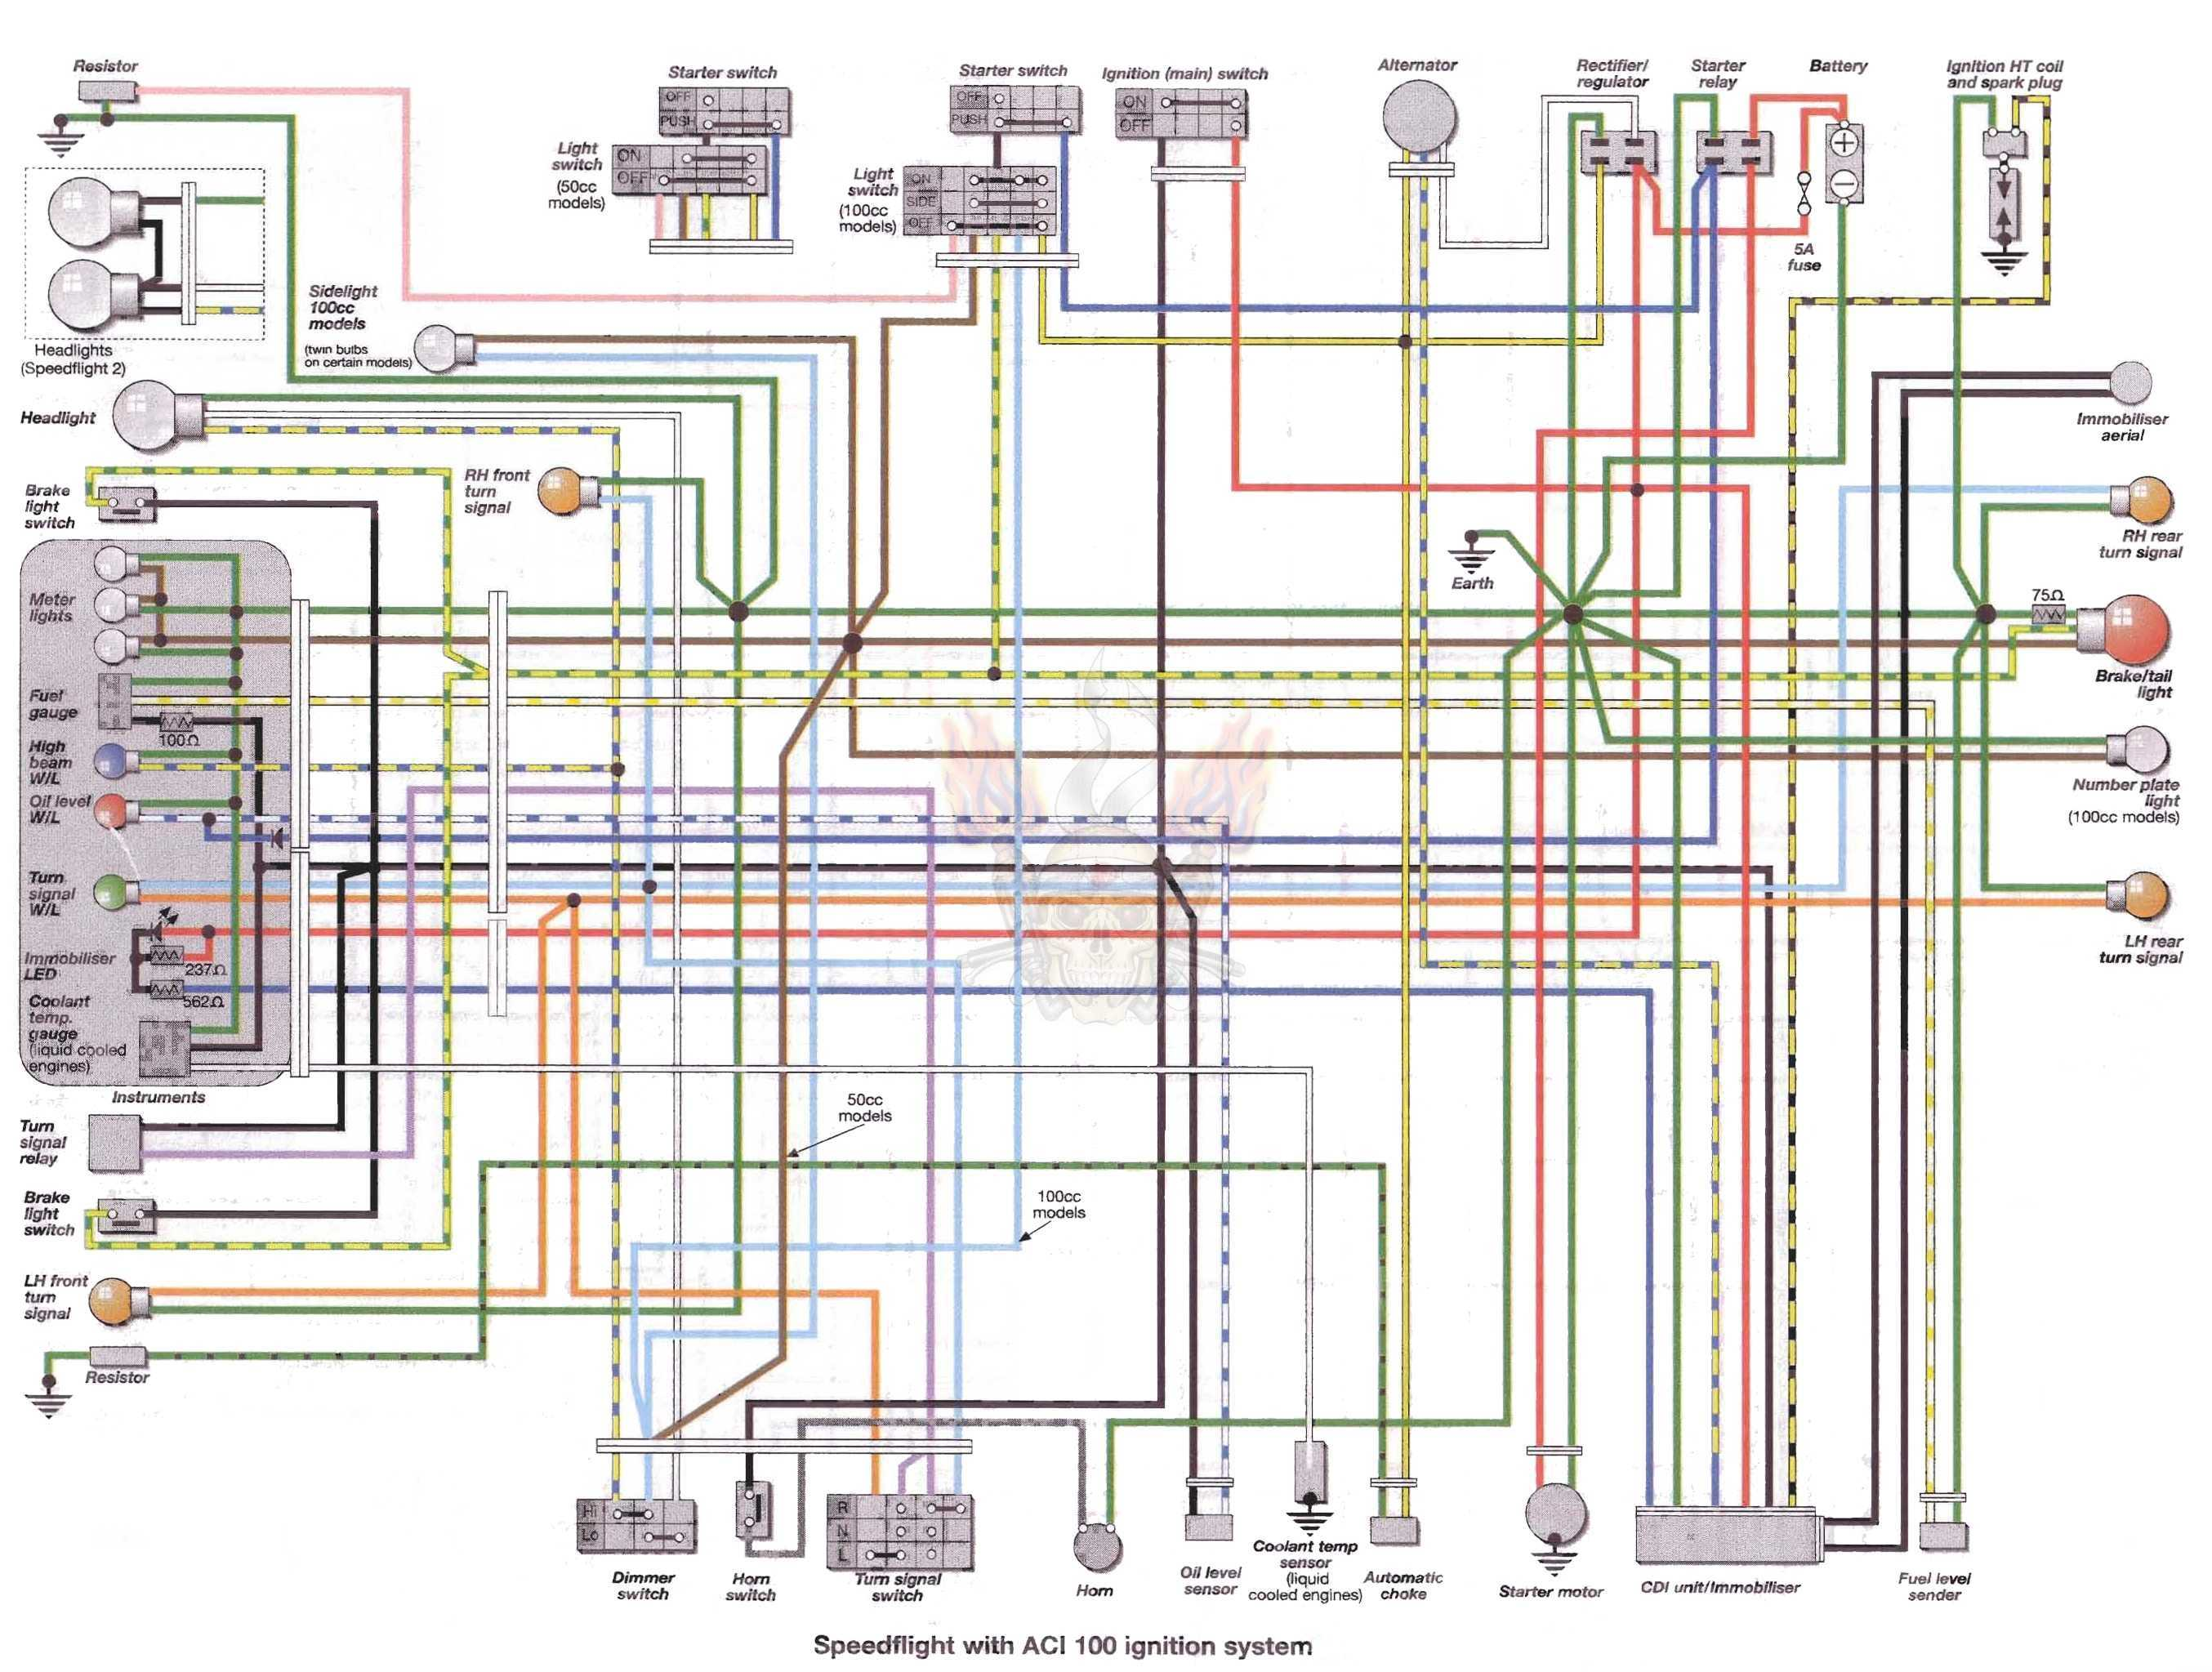 peugeot elystar wiring diagram schematics wiring diagrams u2022 rh seniorlivinguniversity co peugeot elyseo 50 wiring diagram peugeot elystar 125 wiring diagram